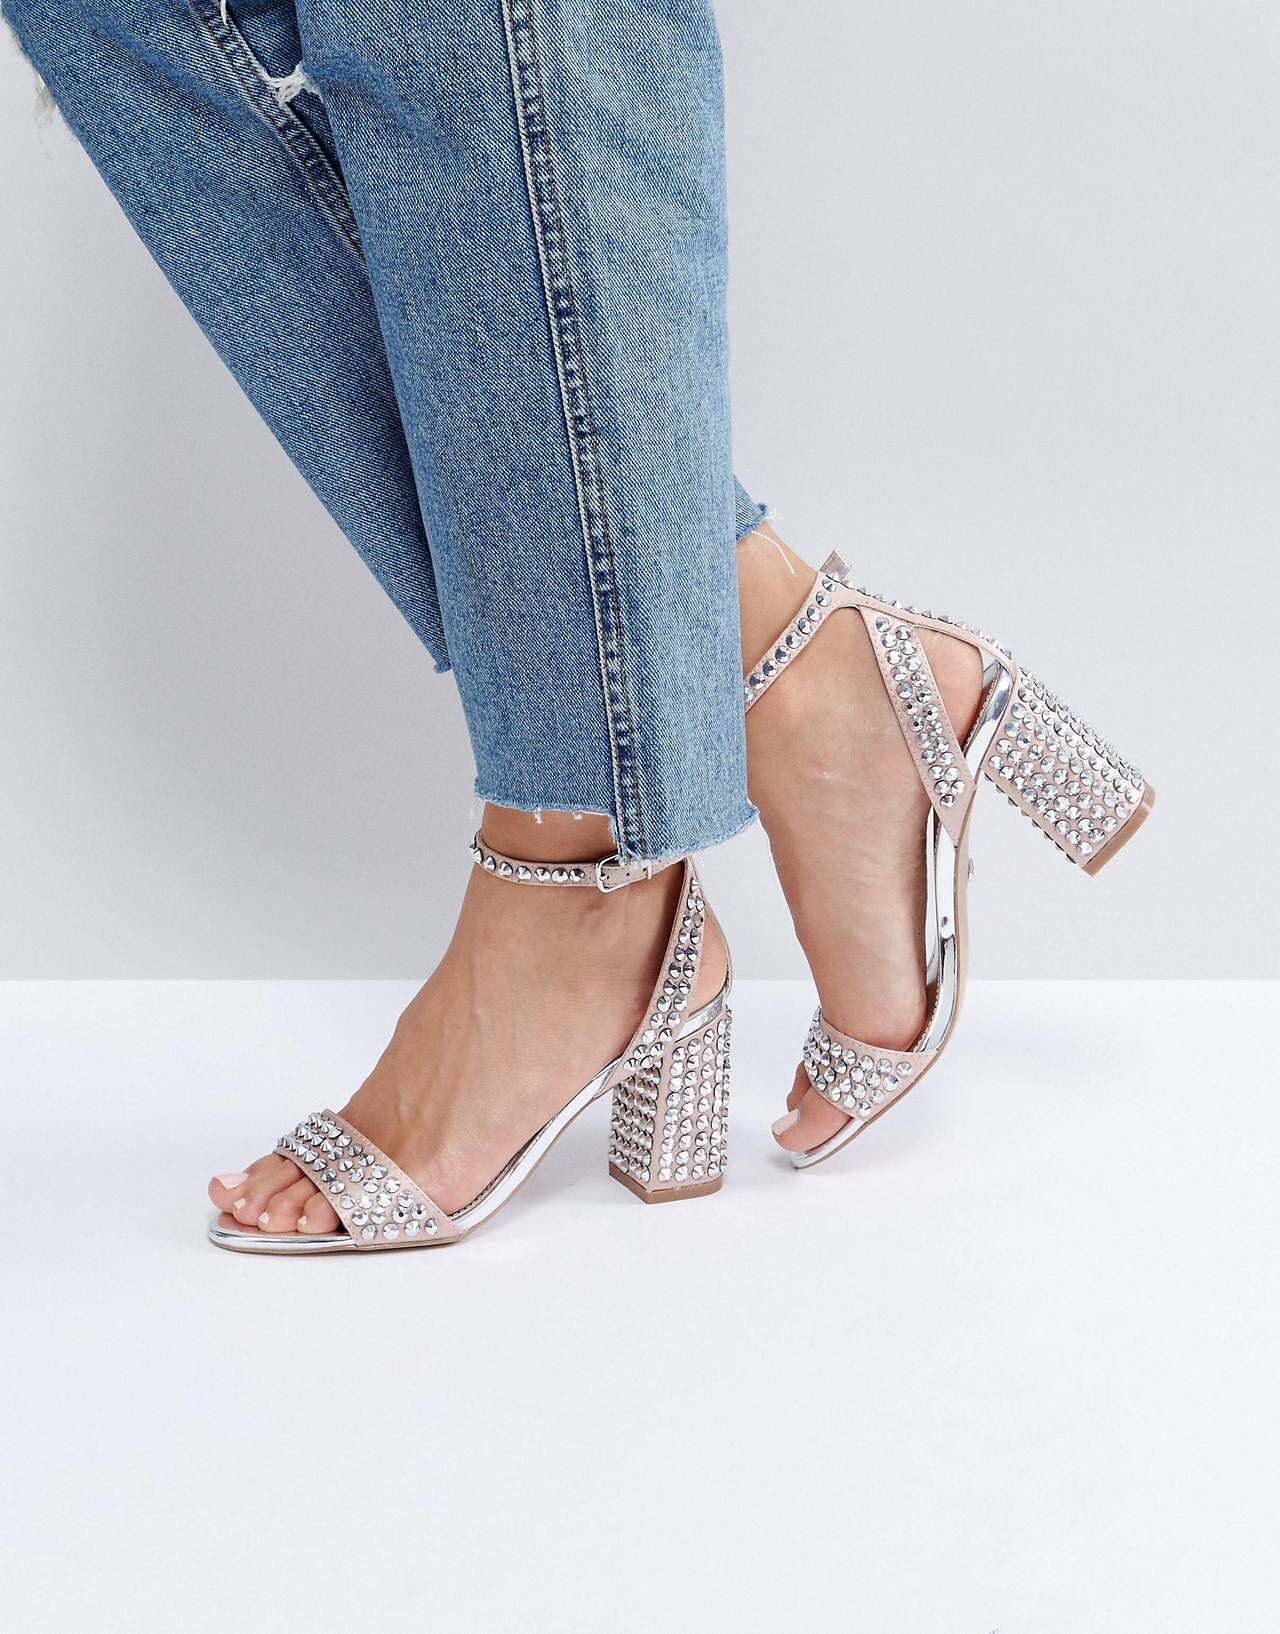 Carvela Gianni Studded Heels | Studded